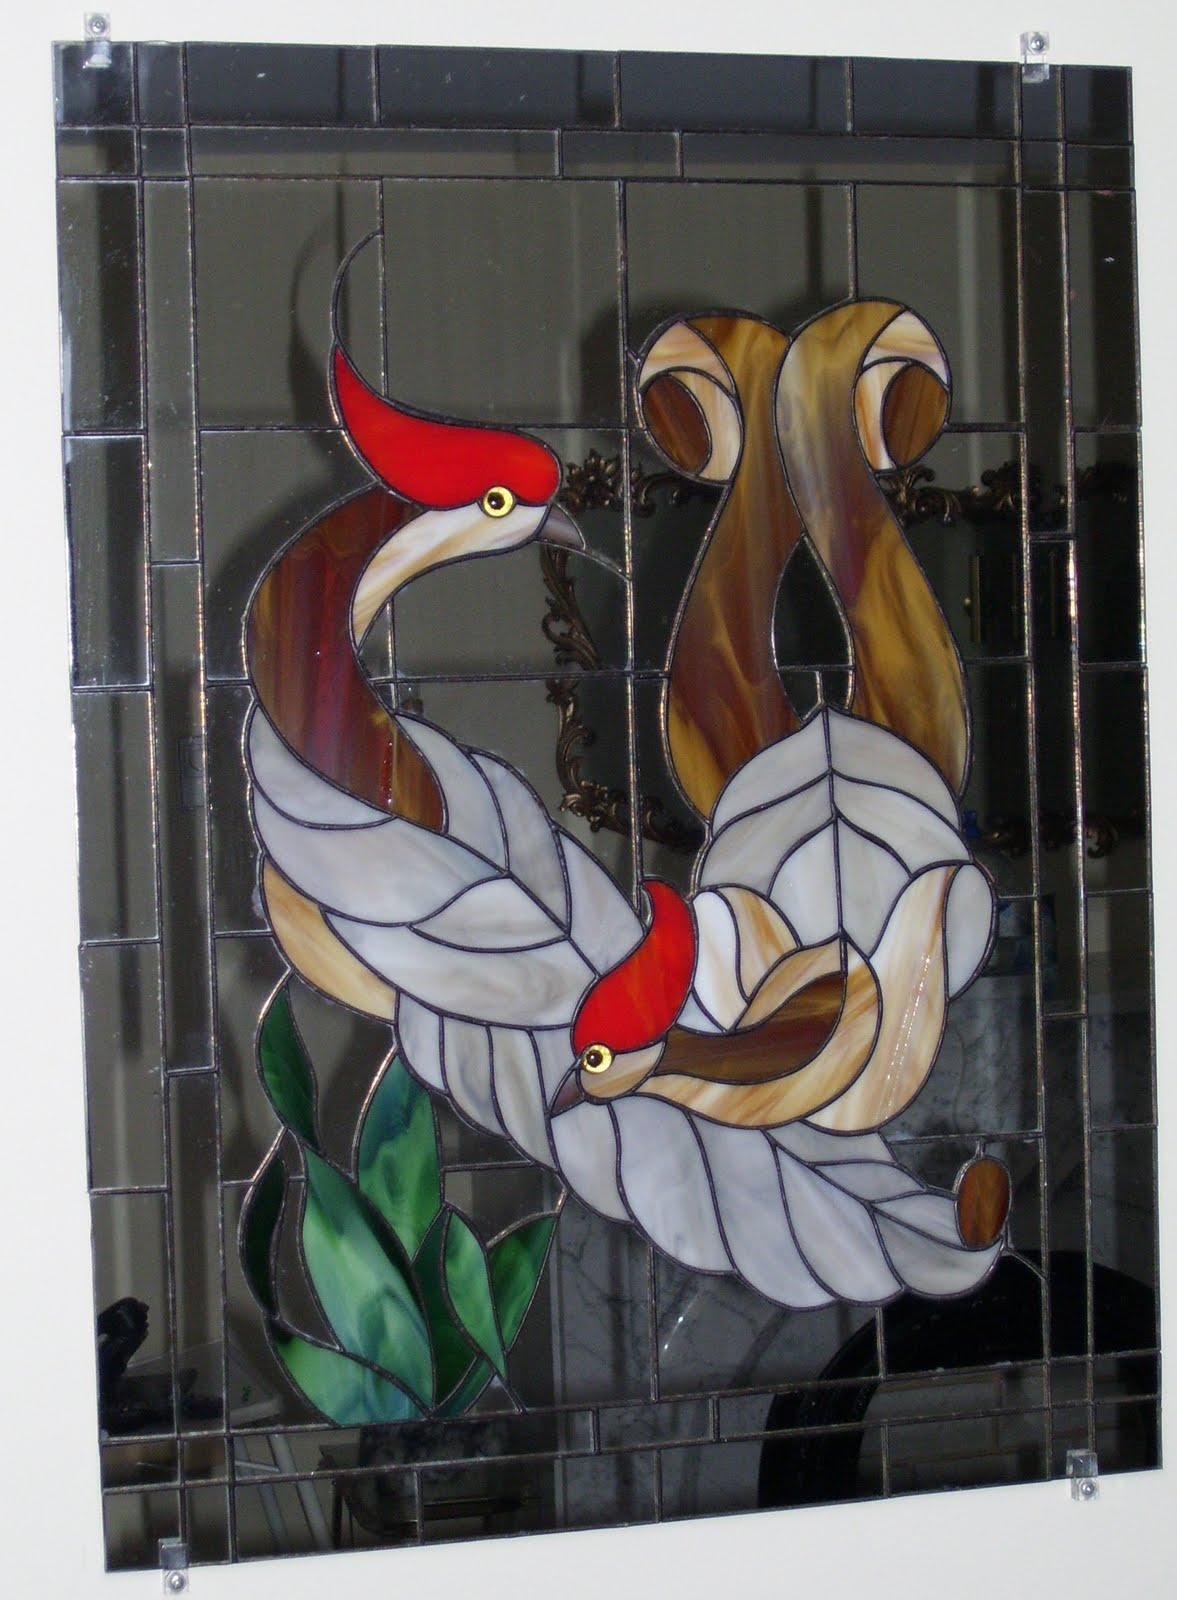 Fermeture de maison 418 243 1337 miroir d 39 entr e miroir d coratif cadre balayeuse - Miroir d entree ...